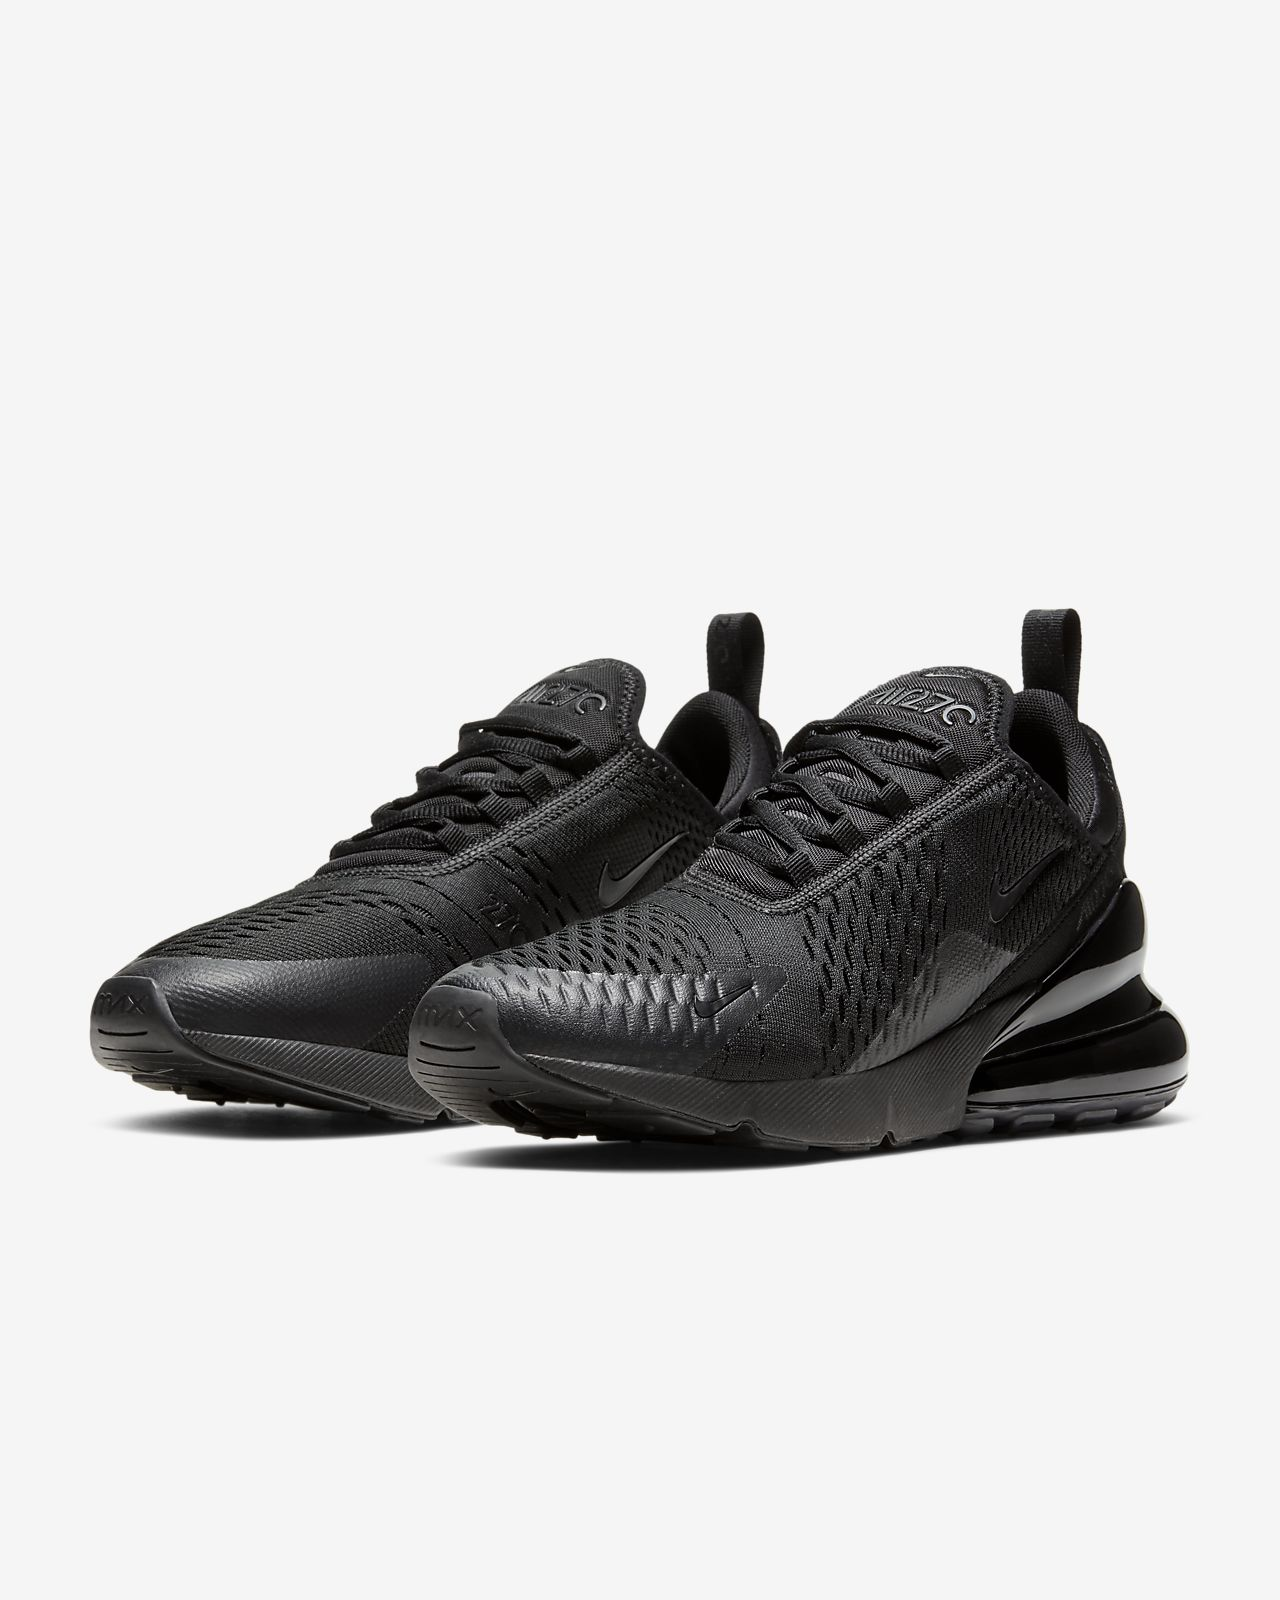 Men's Nike Air Max 270 Flyknit Black Green AH8050 030 Boys Running Shoes AH8050 030